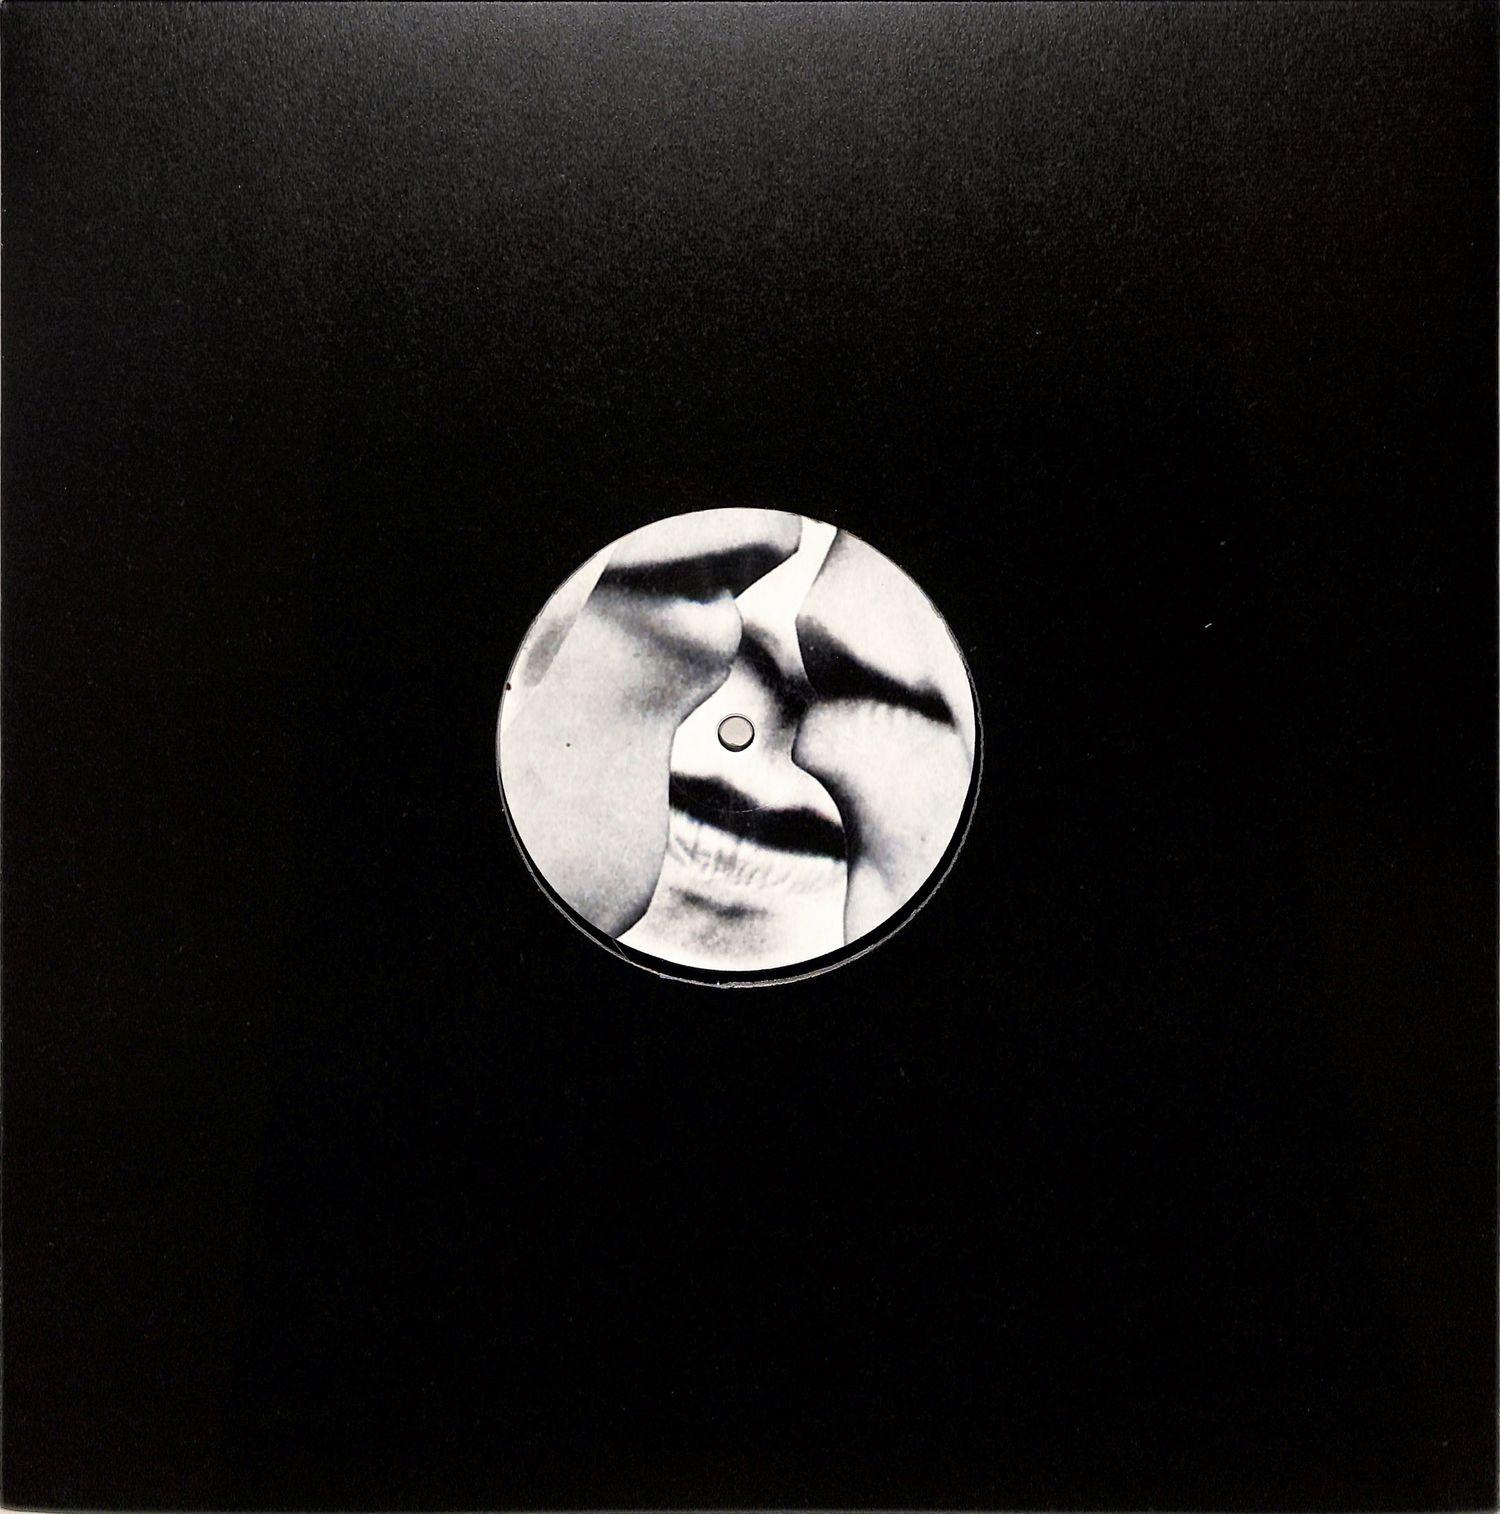 Nthng - 1996